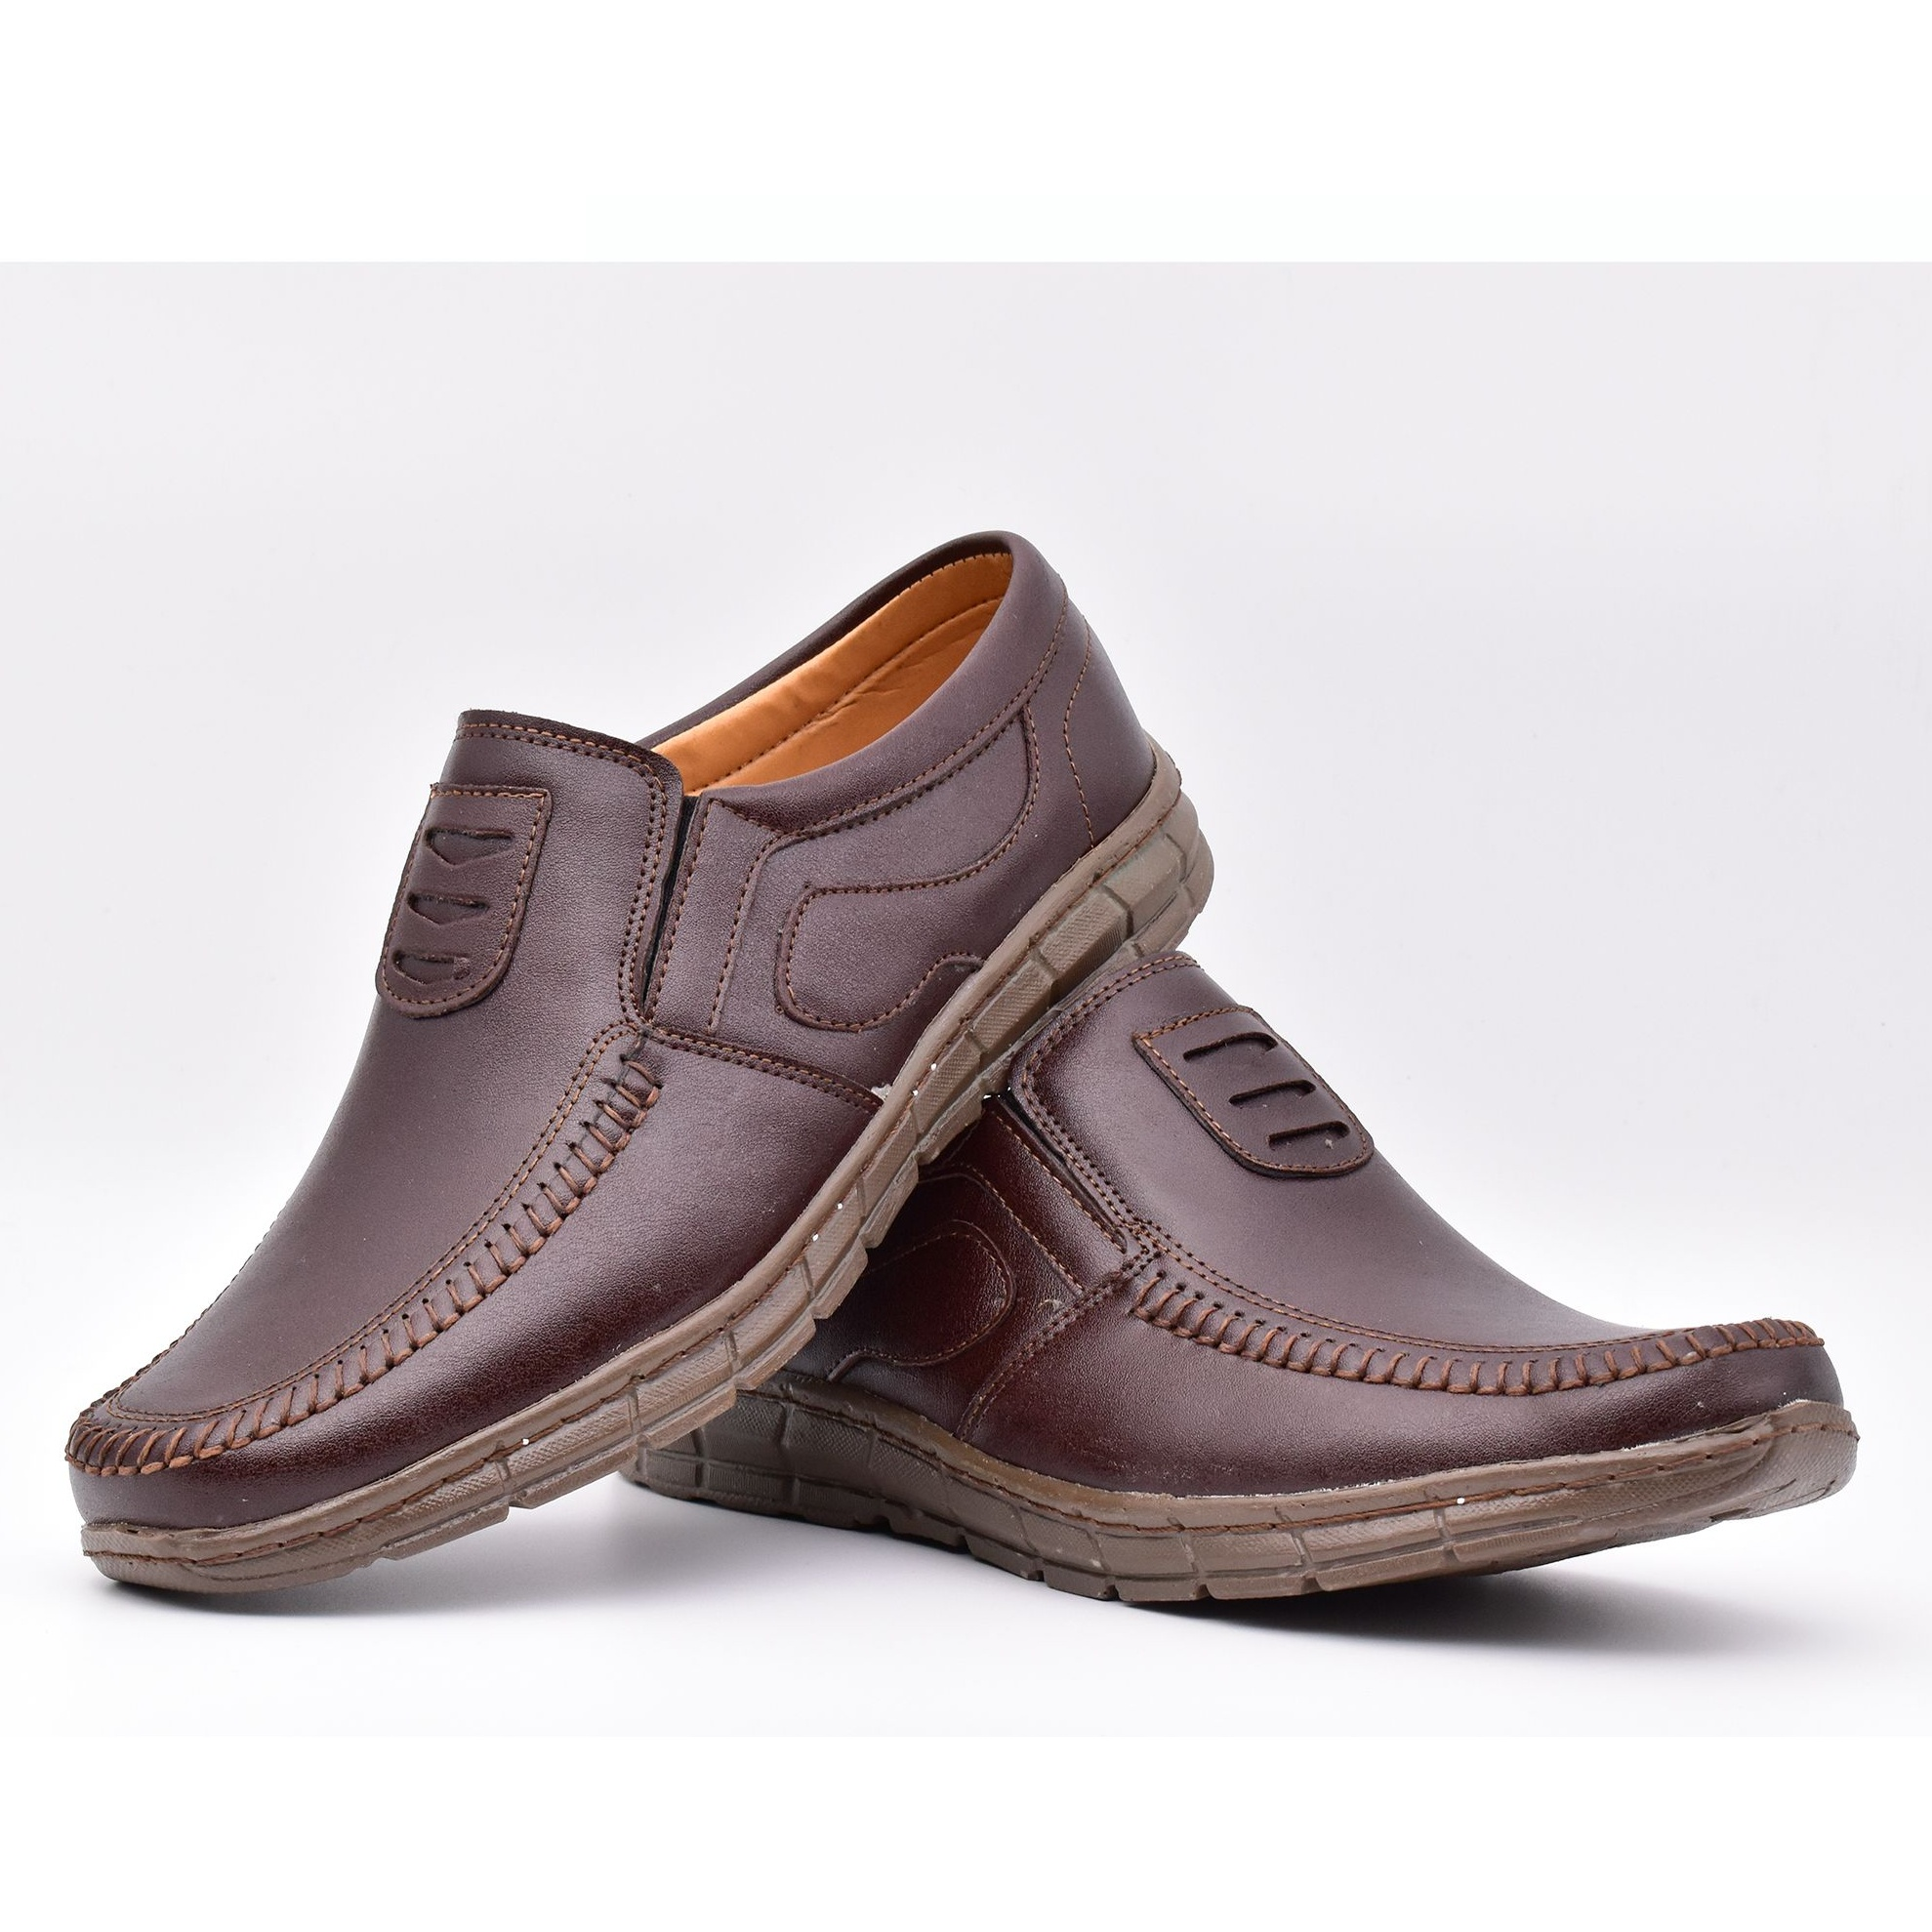 کفش روزمره مردانه مدل سپهر کد 4876